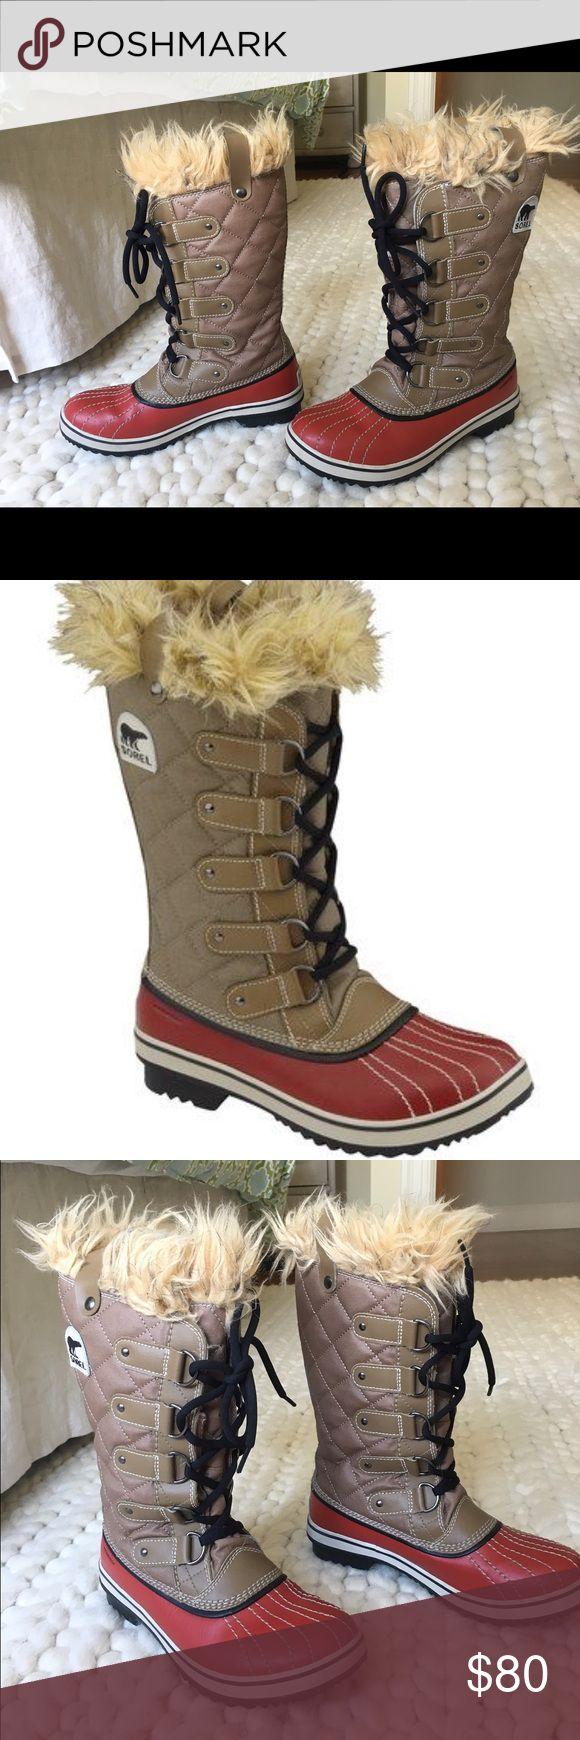 15  best ideas about Sorel Snow Boots on Pinterest | Sorel womens ...